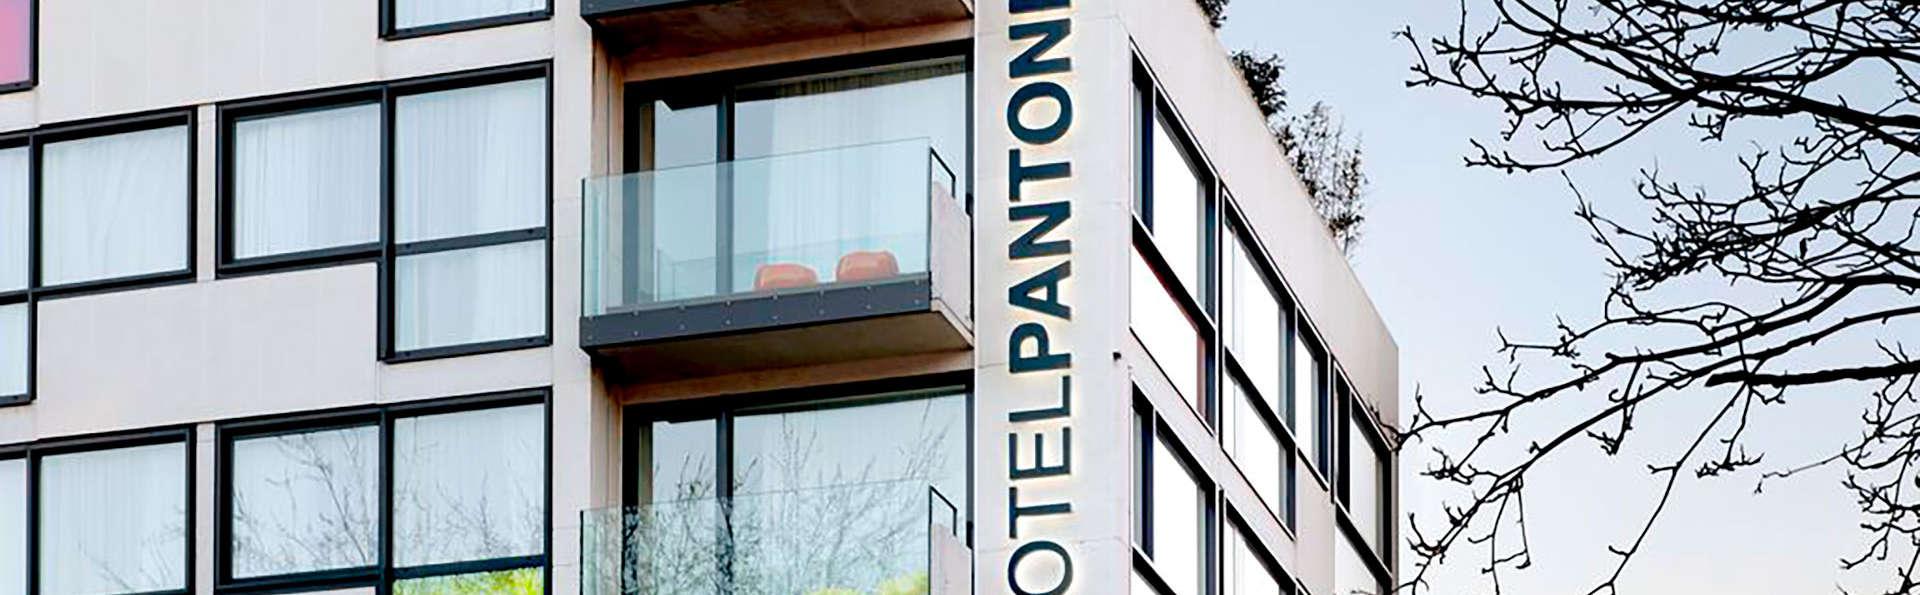 Pantone Hotel - EDIT_FRONT_02.jpg